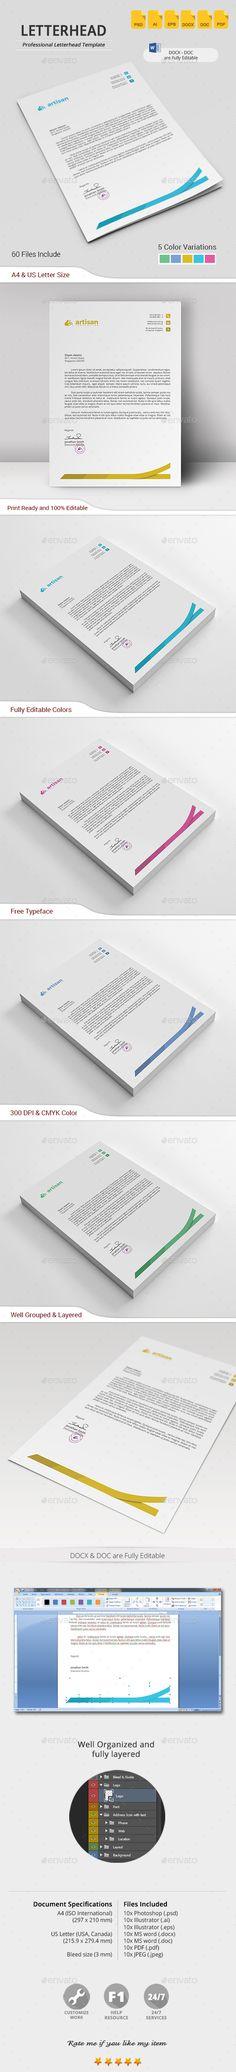 Letterhead Letterhead, Stationery printing and Print templates